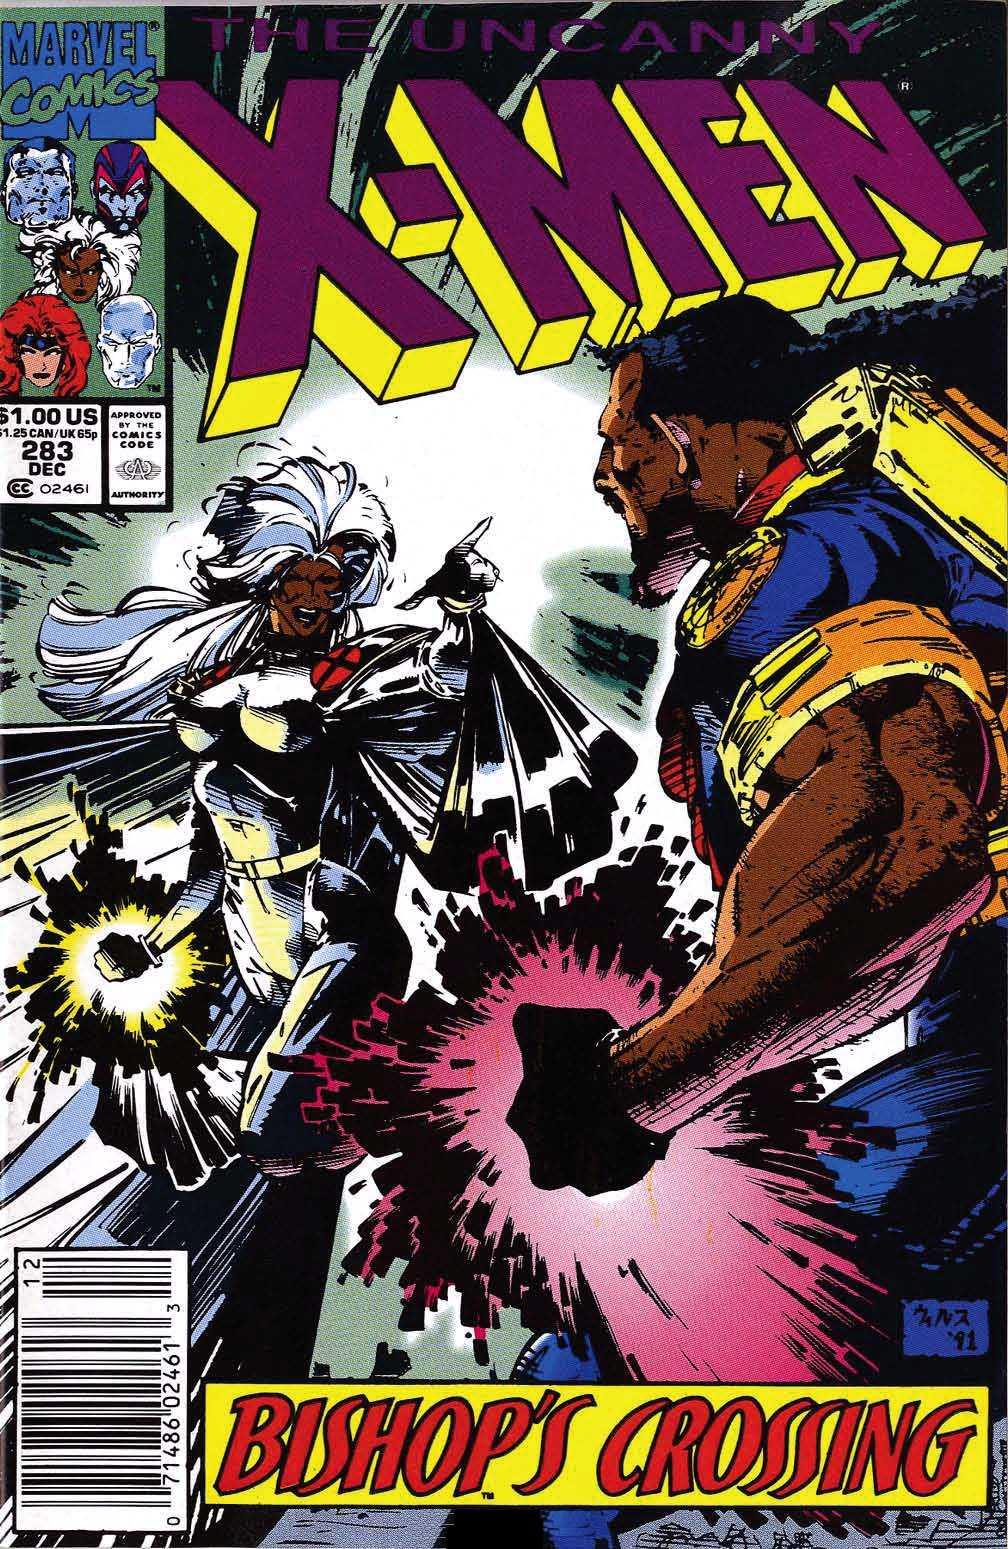 Men Character List And Powers Uncanny x-men vol 1 283X Men Character List And Powers